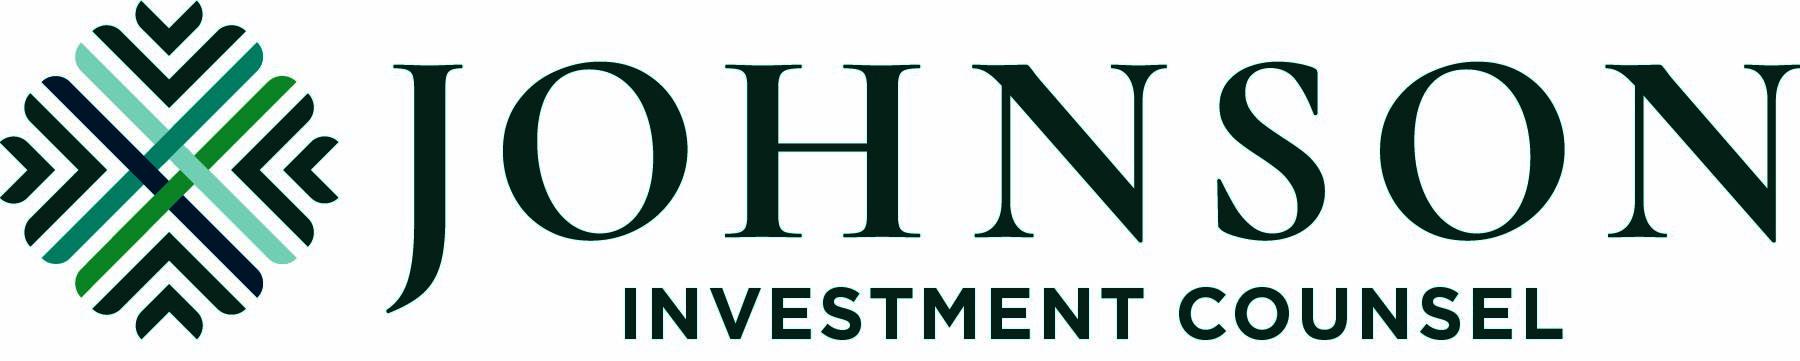 johnston investment slideshow